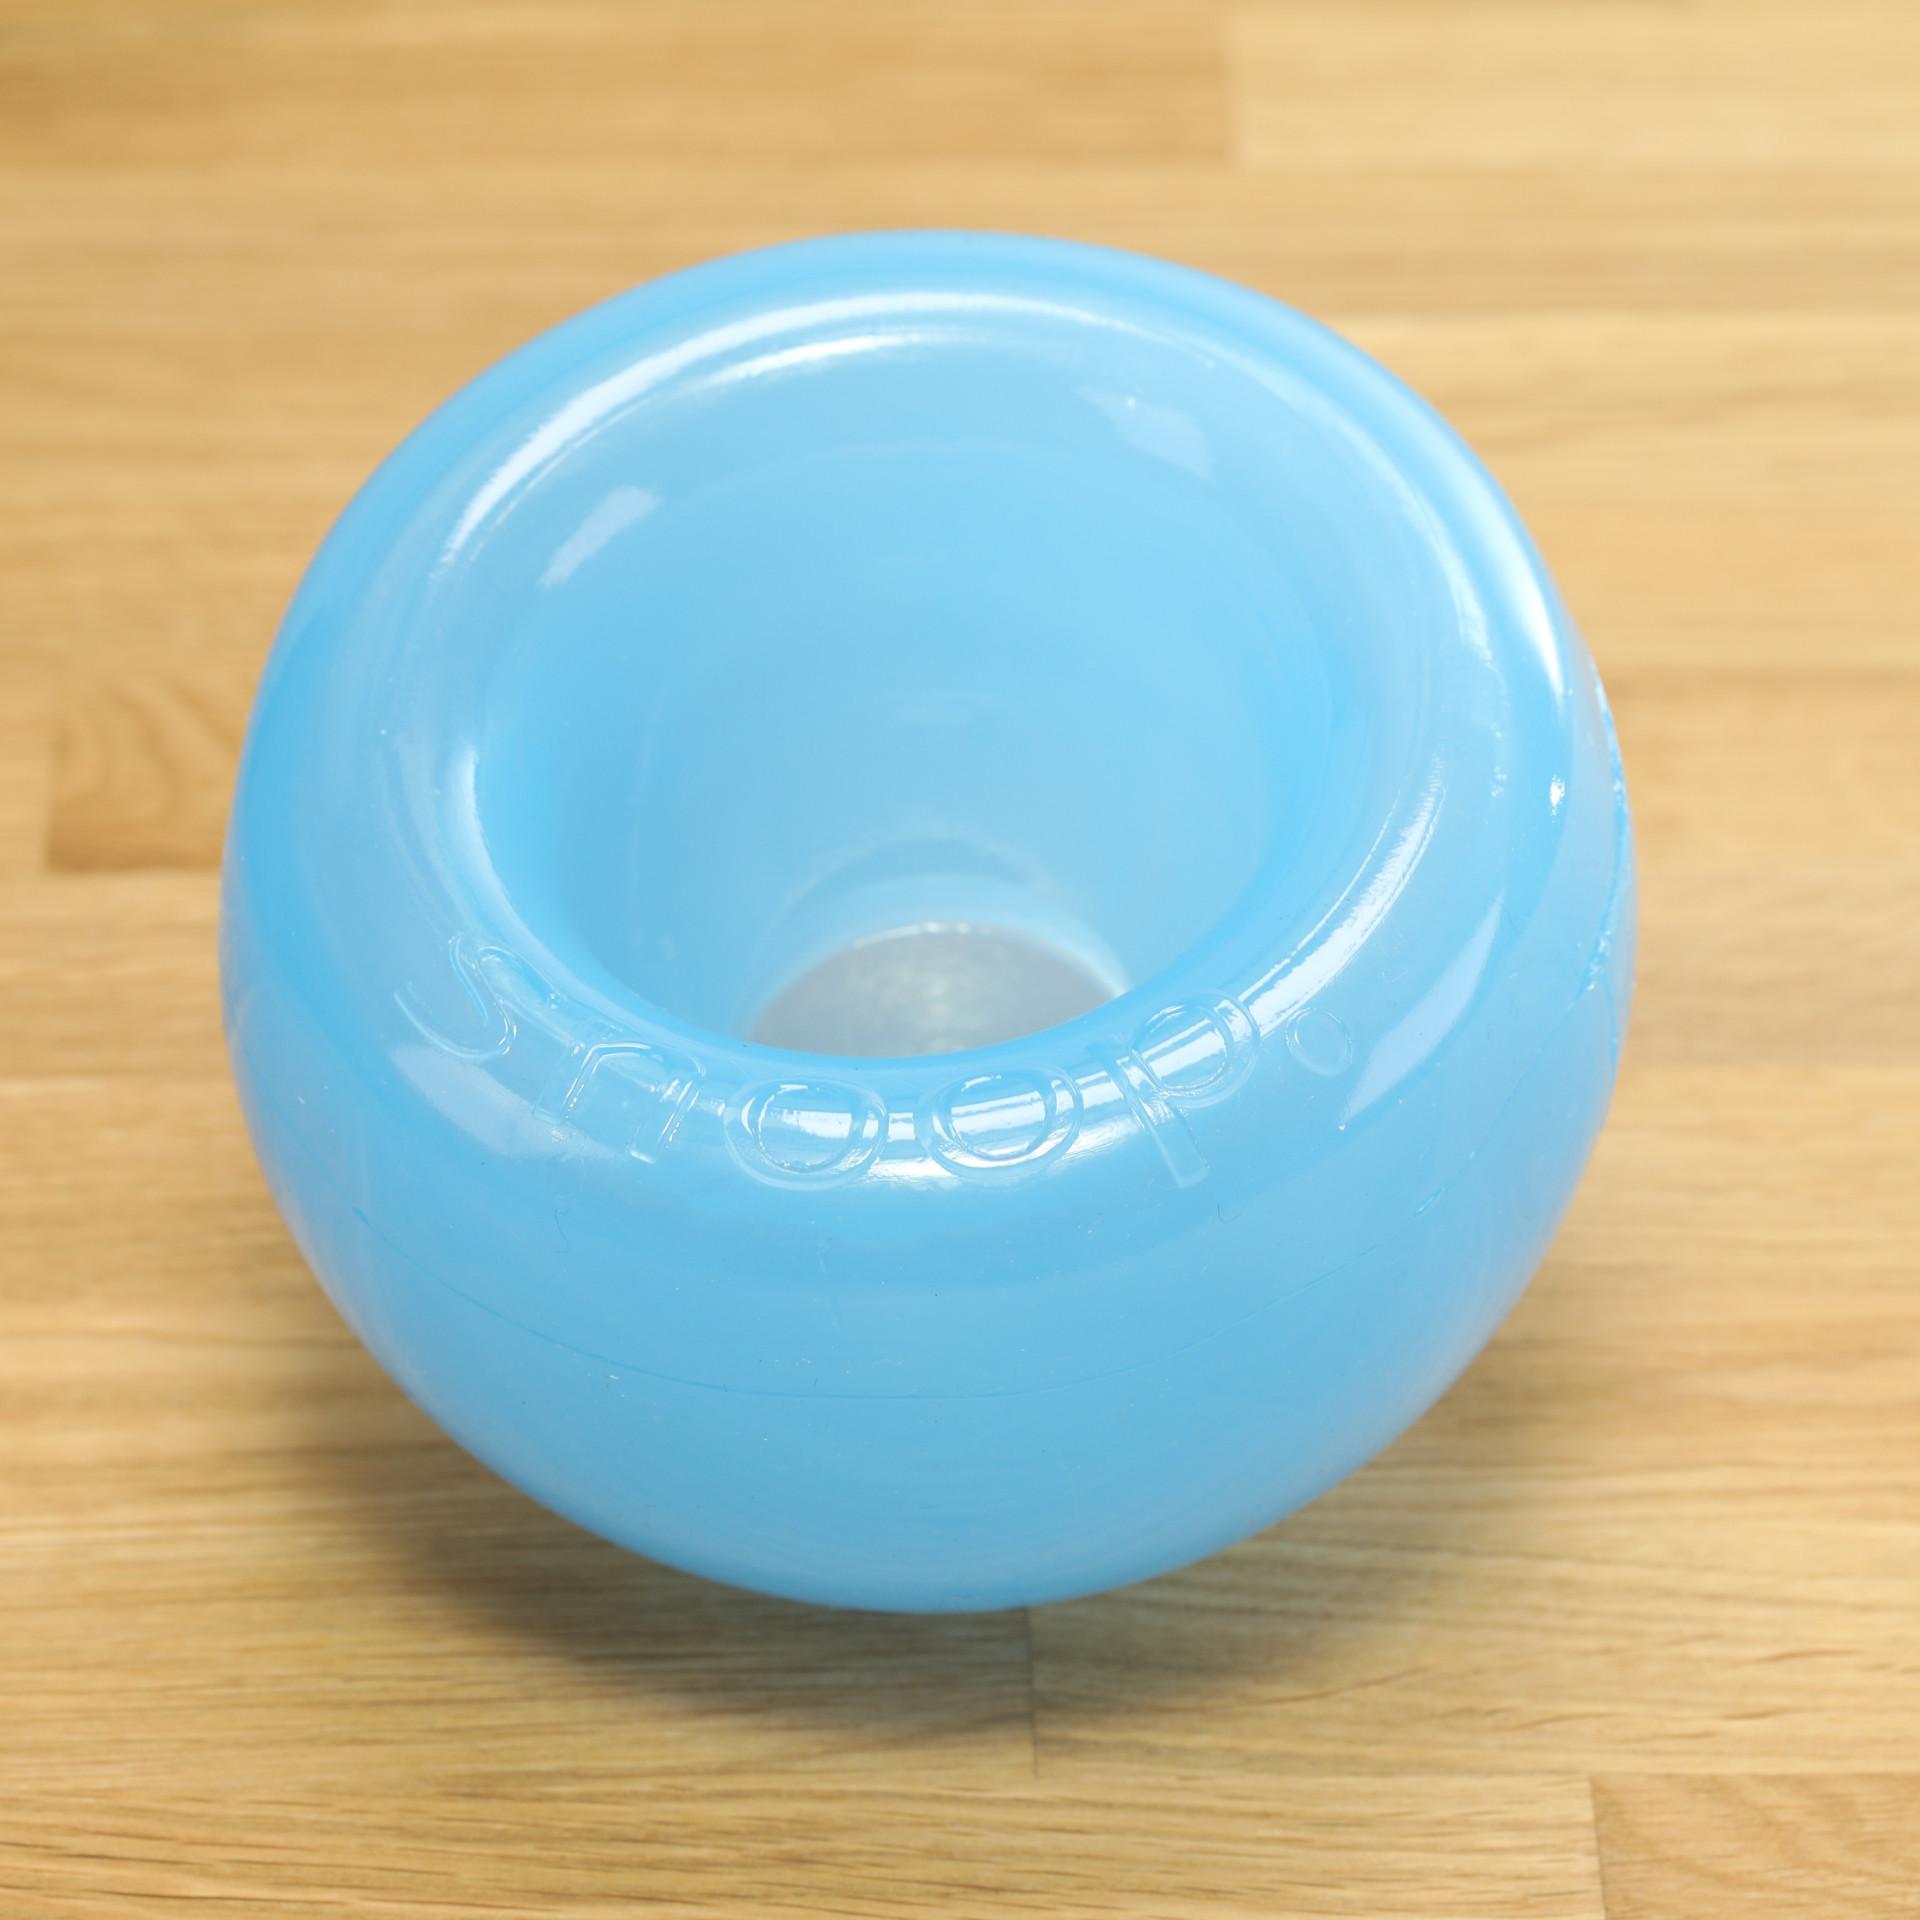 Hundespielzeug Ball Snoop blau